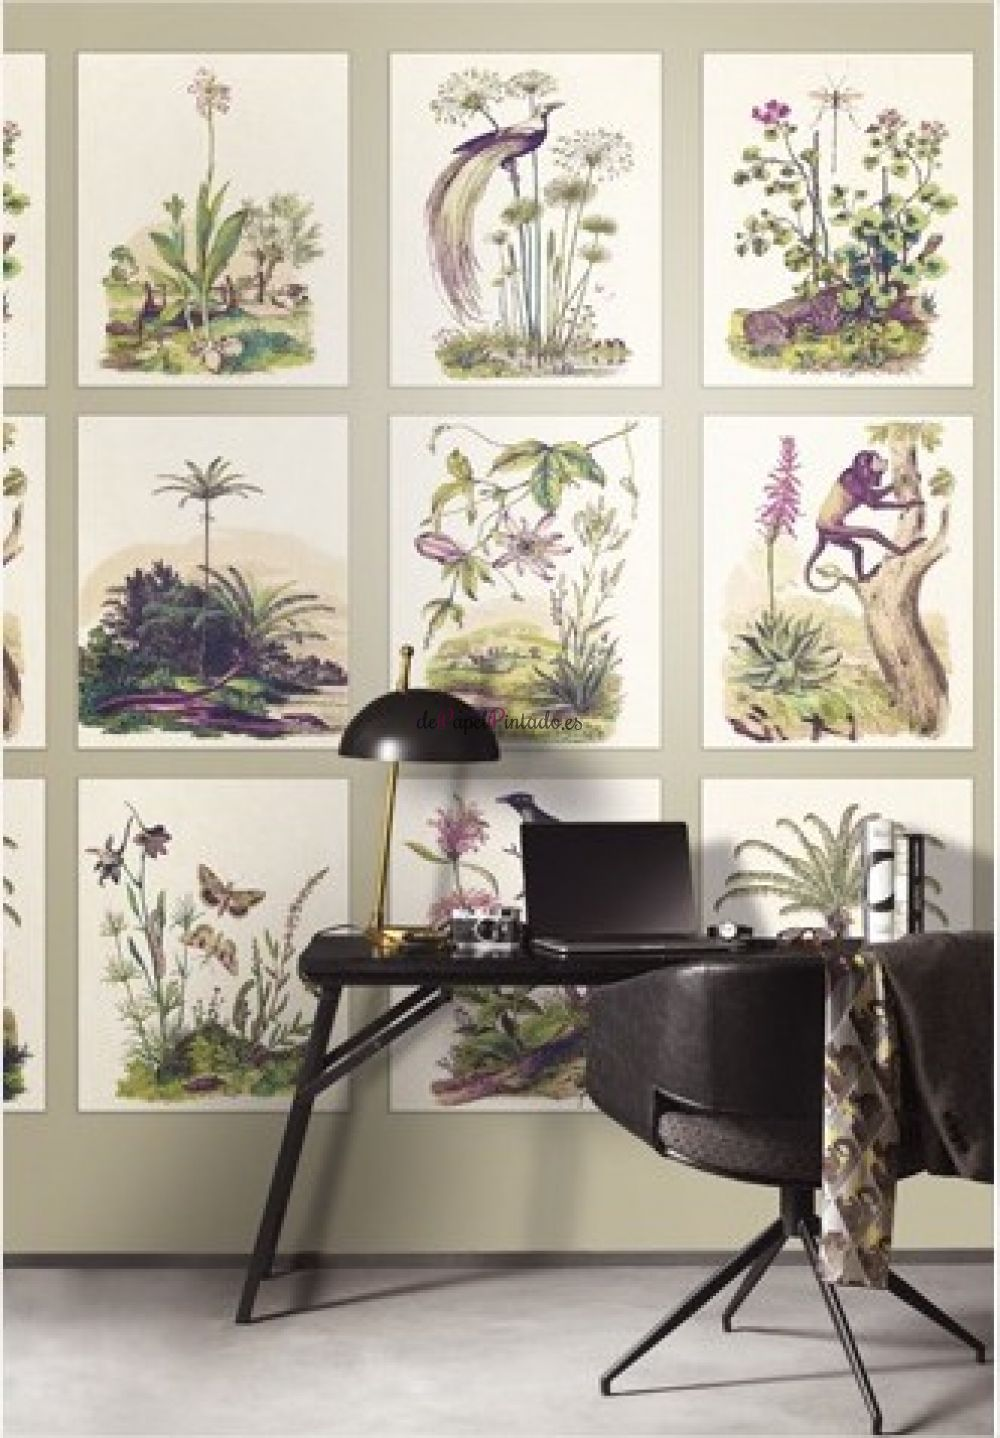 Papel pintado para muebles stunning papel pintado muebles - Papel pintado adhesivo para muebles ...